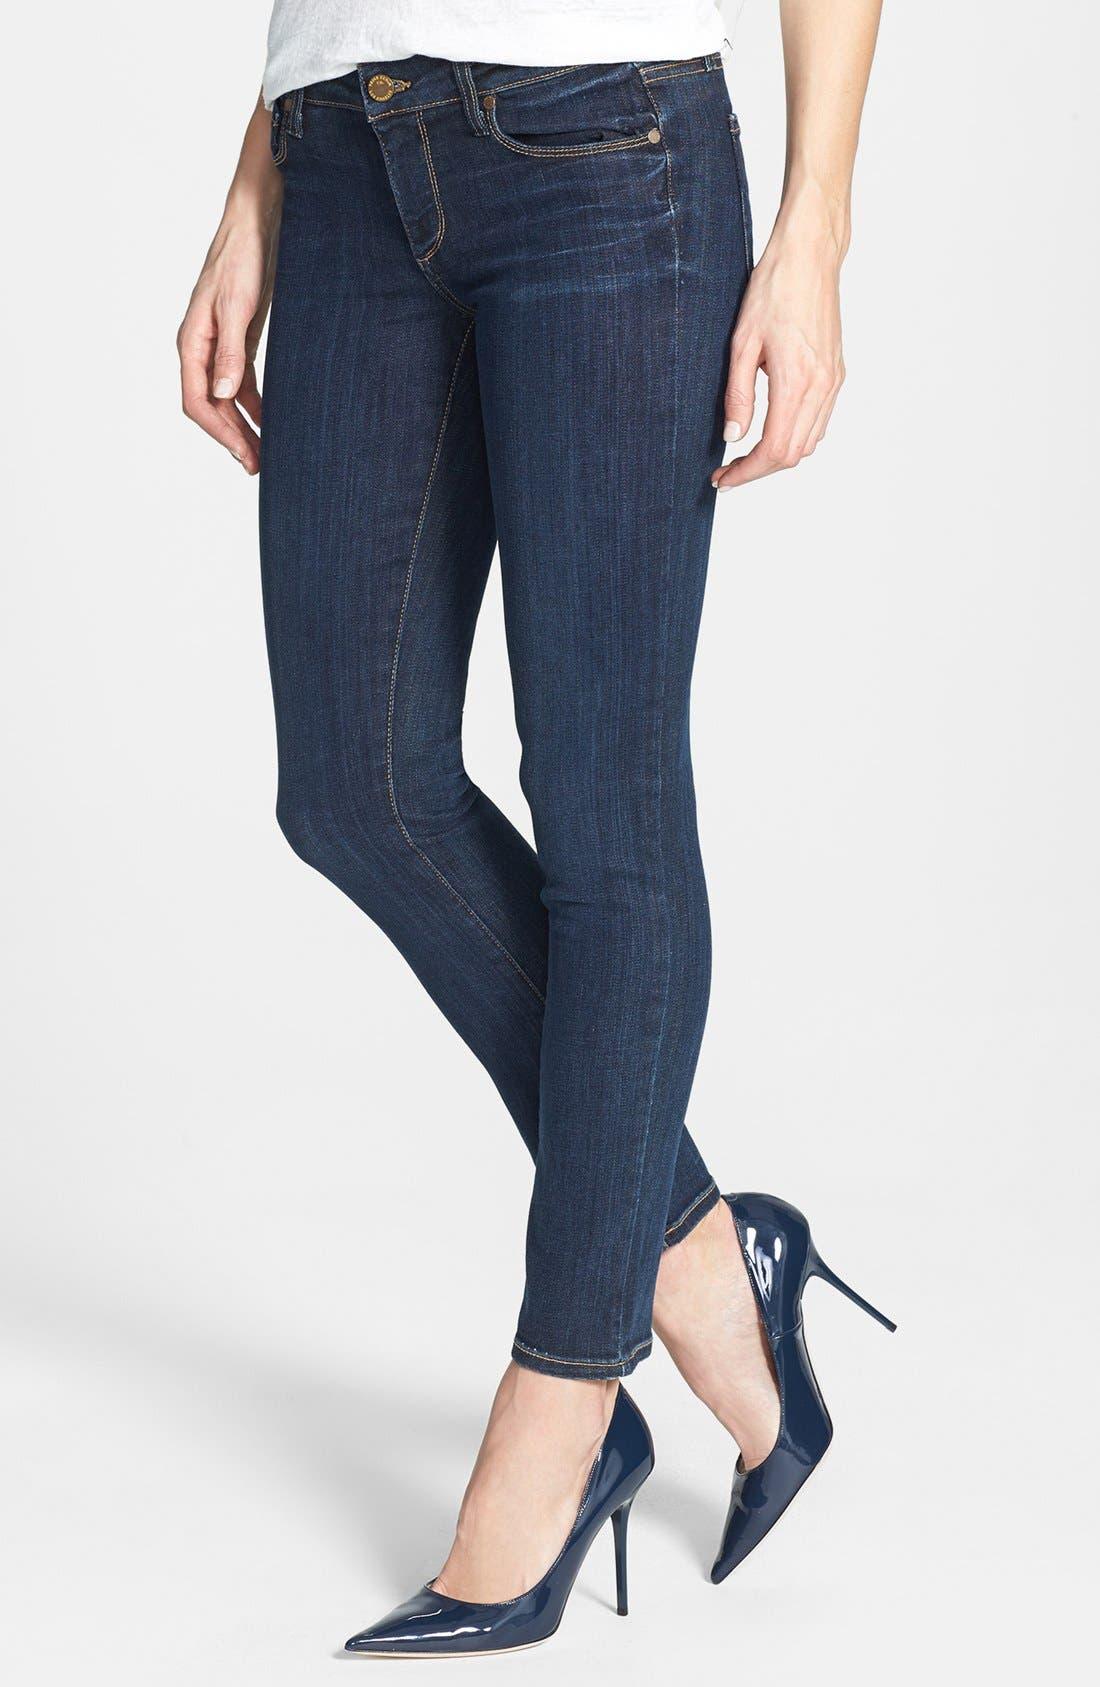 Alternate Image 1 Selected - Paige Denim 'Skyline' Skinny Ankle Jeans (Delancy)